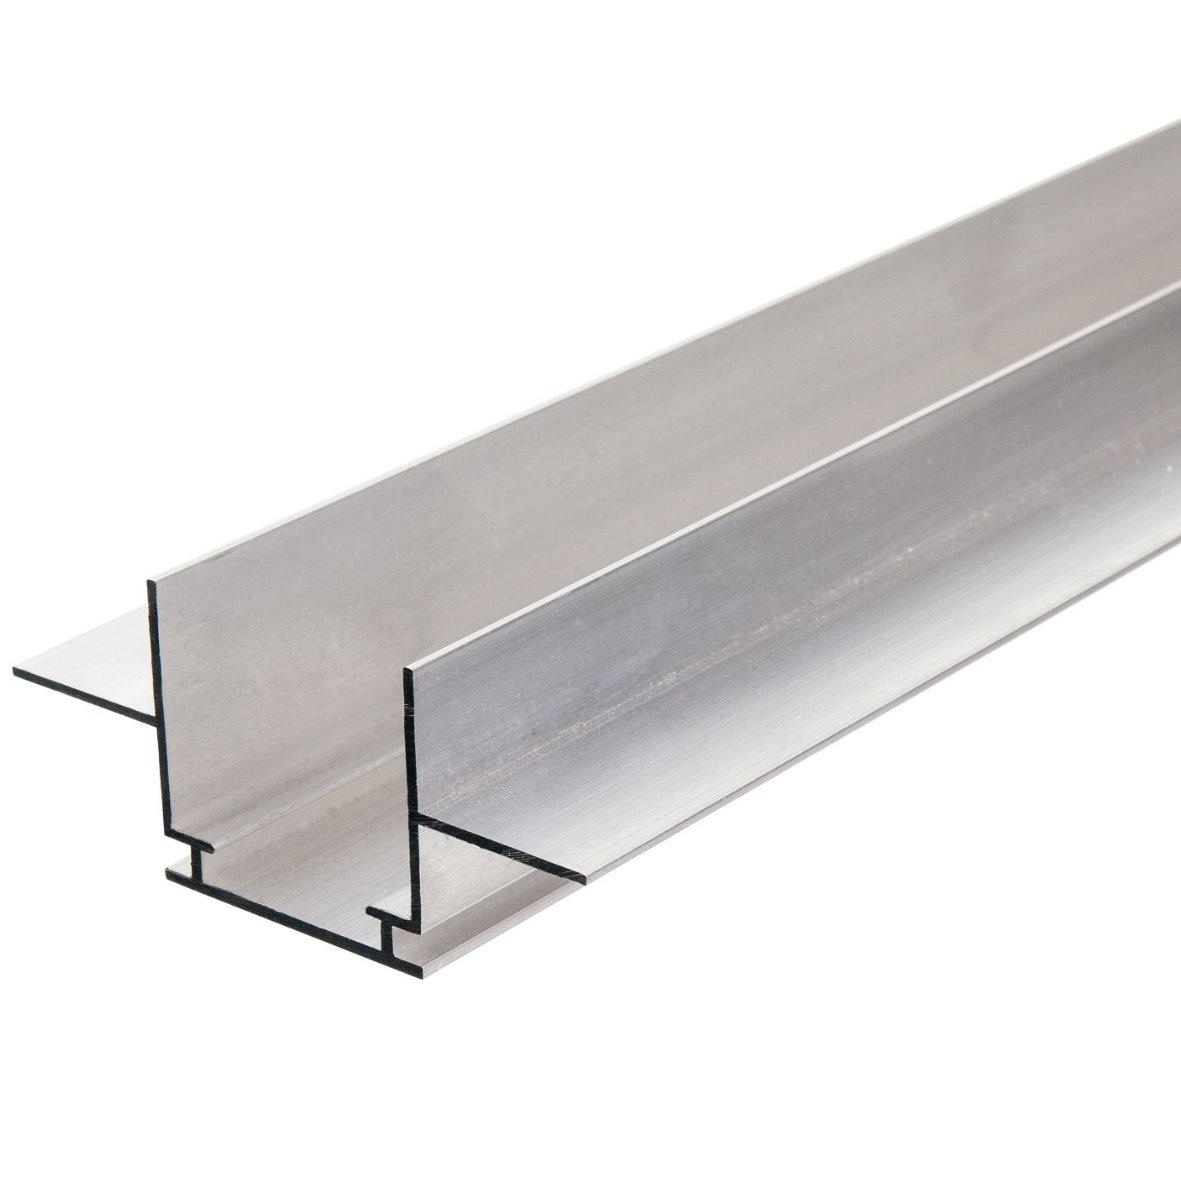 led alu profil aluprofil schiene aluminium strip stripe streifen profilschiene ebay. Black Bedroom Furniture Sets. Home Design Ideas